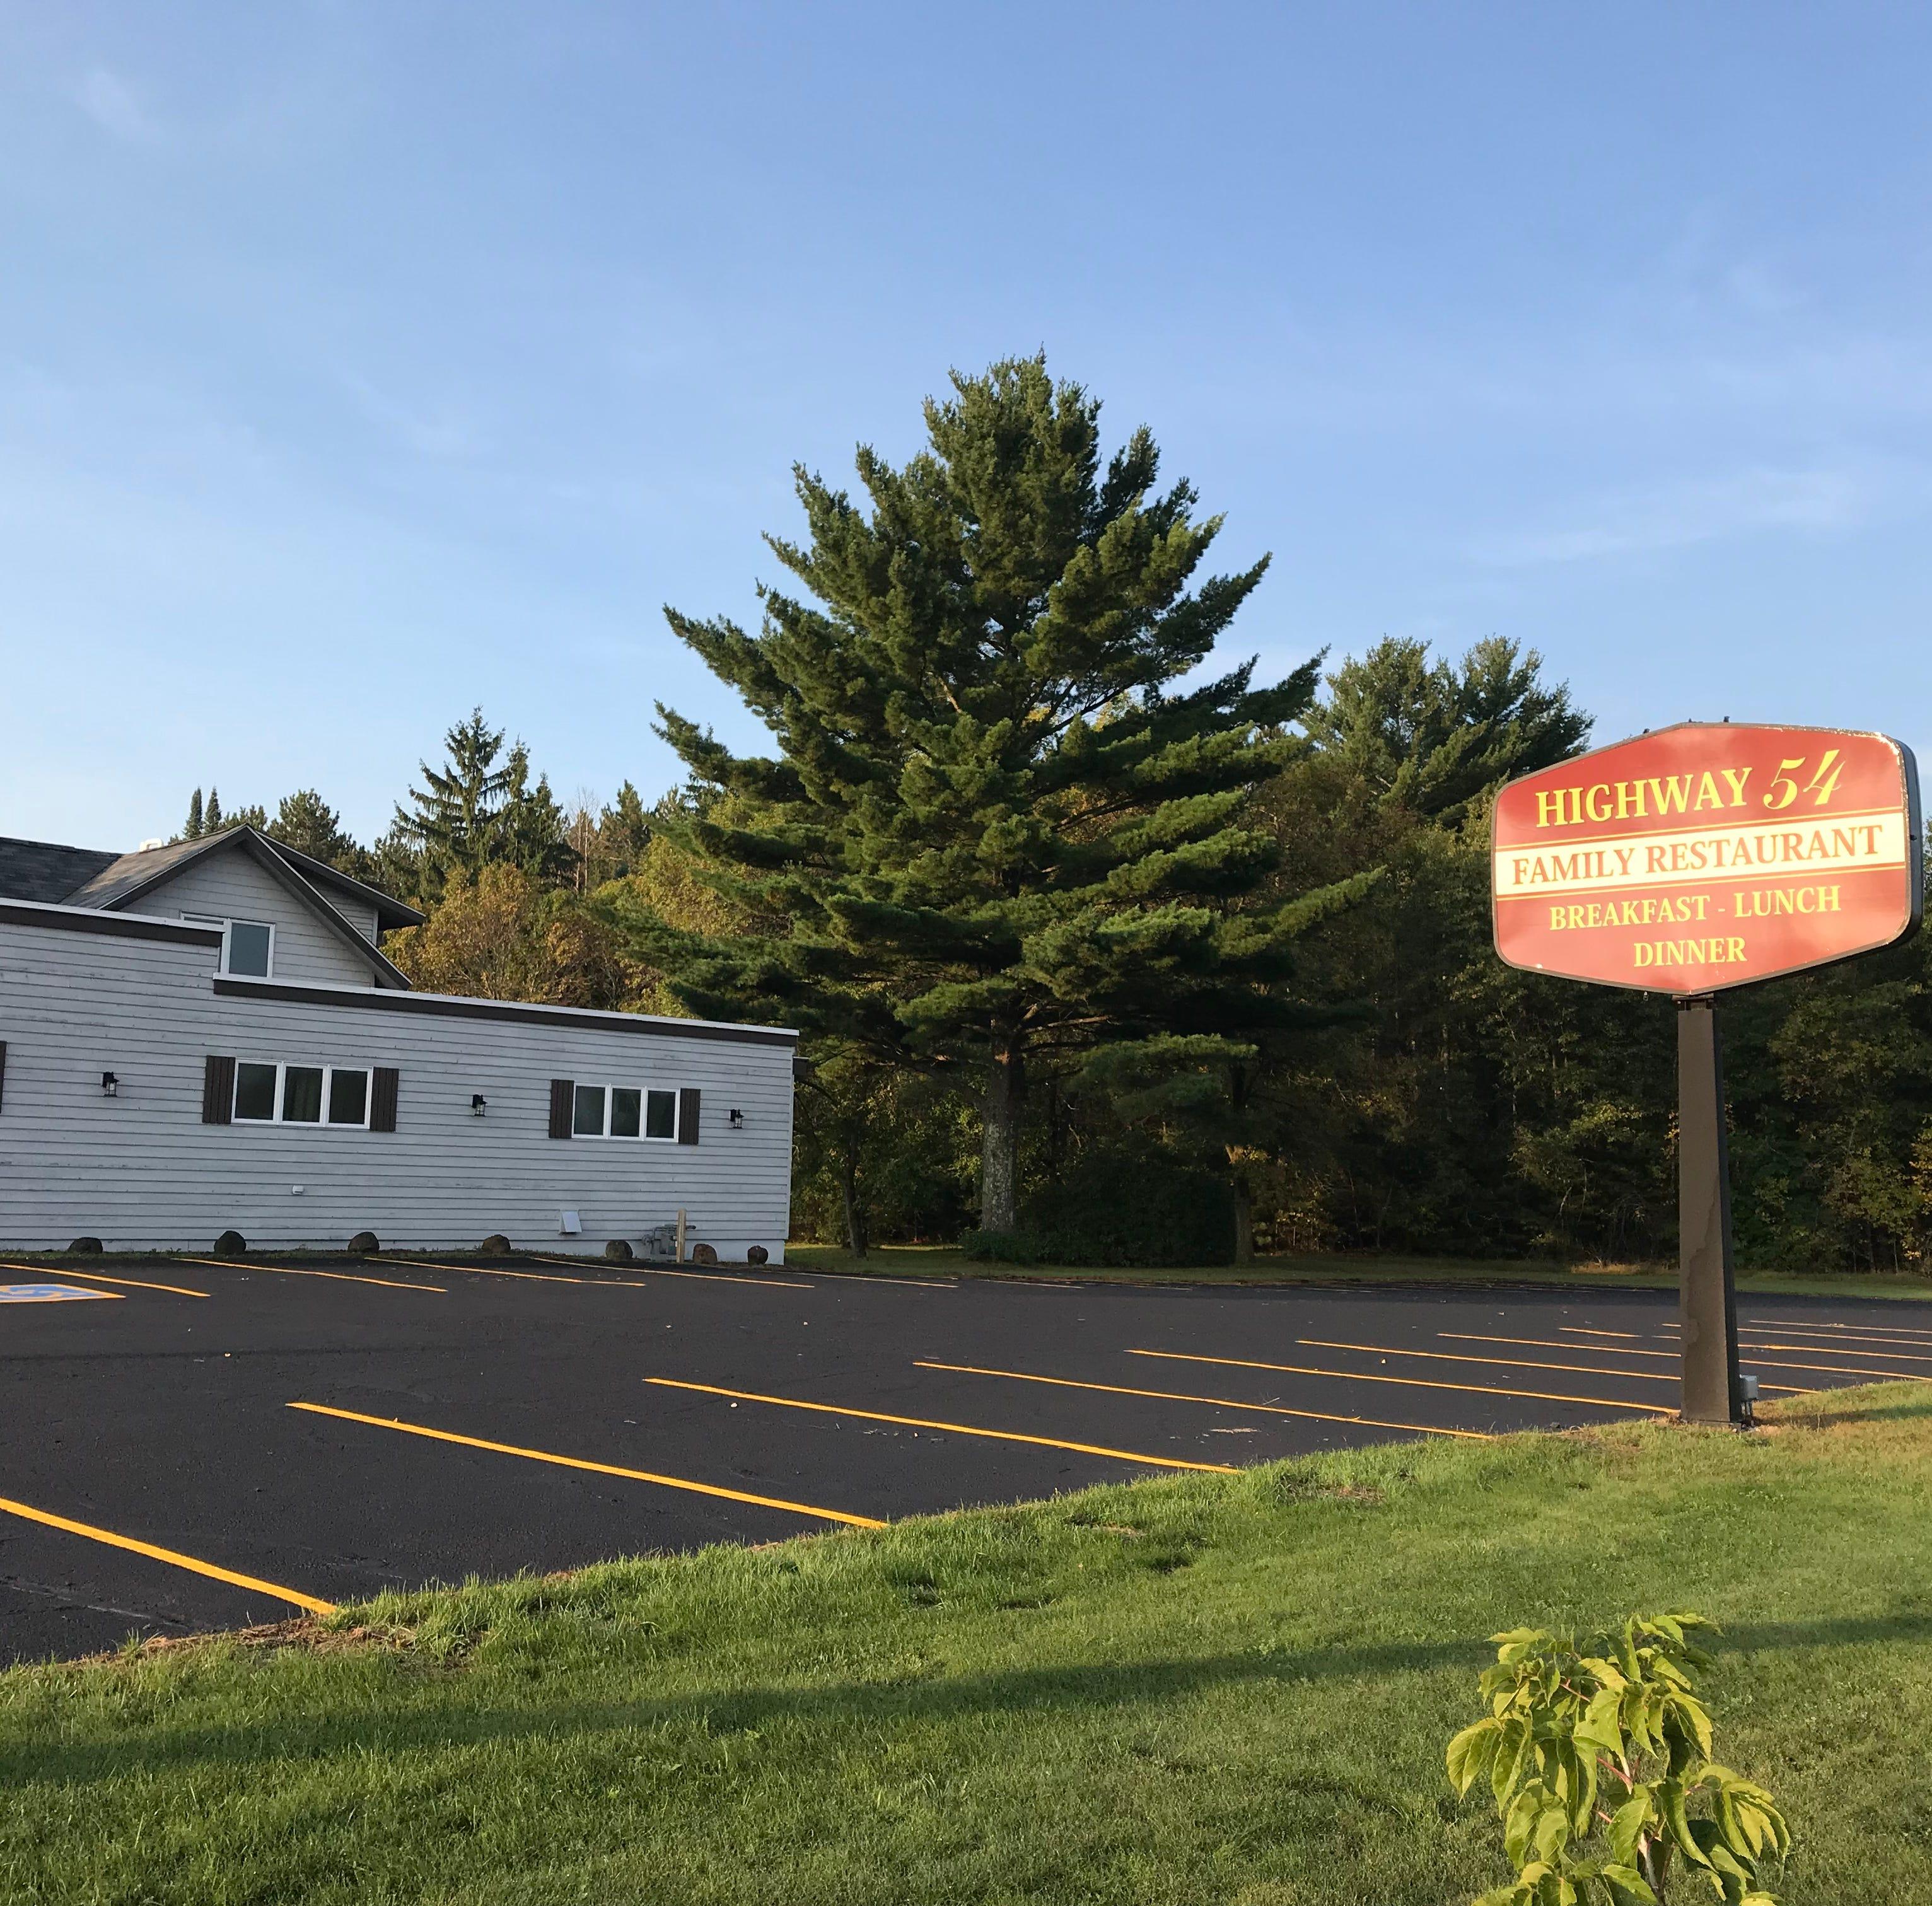 Highway 54 Family Restaurant to open near Wisconsin Rapids